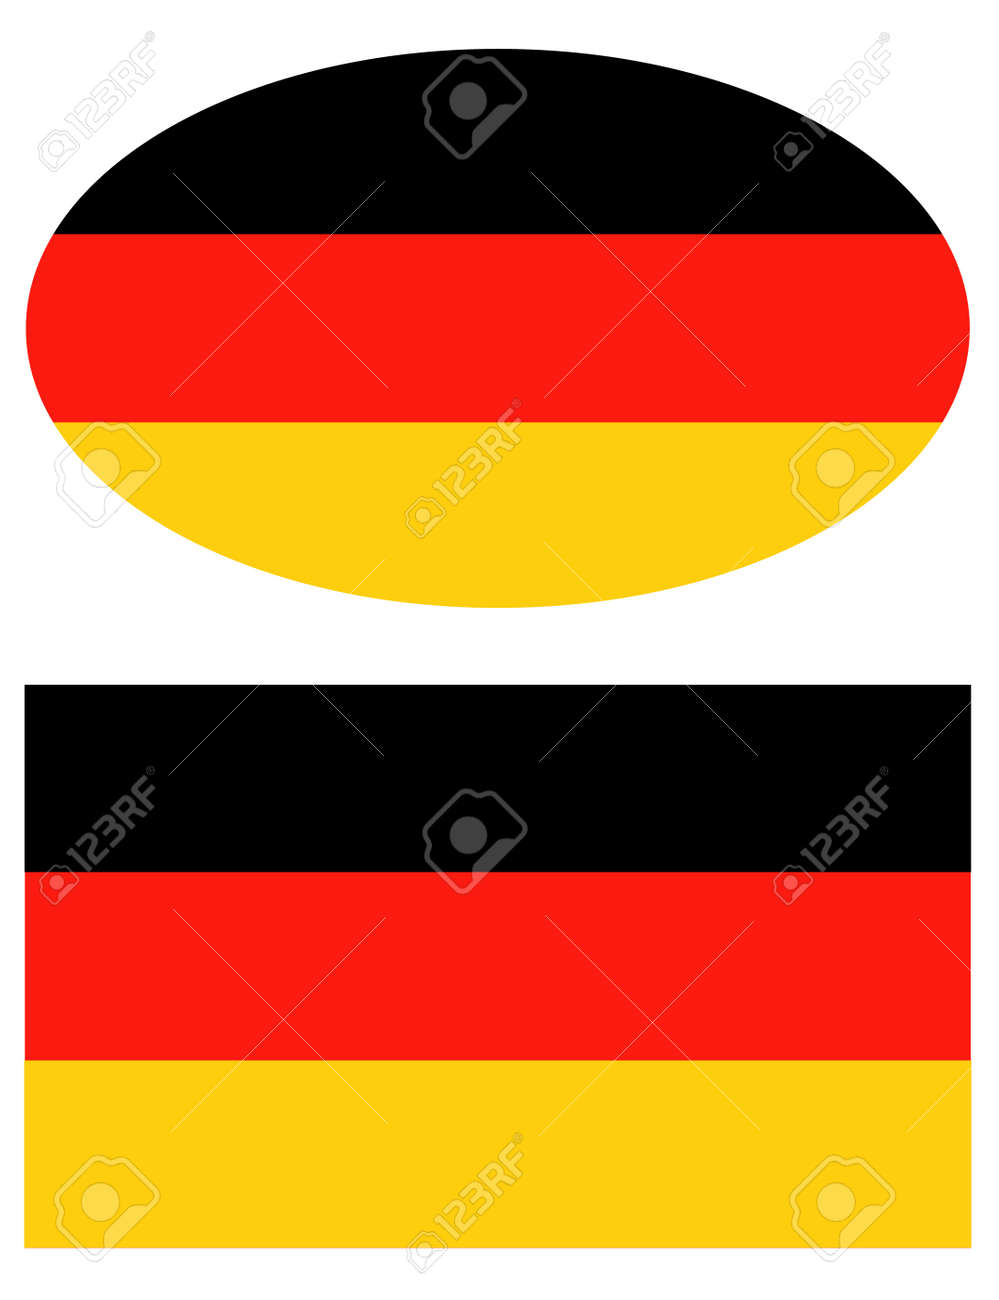 vector illustration of Germany flag - 143367223